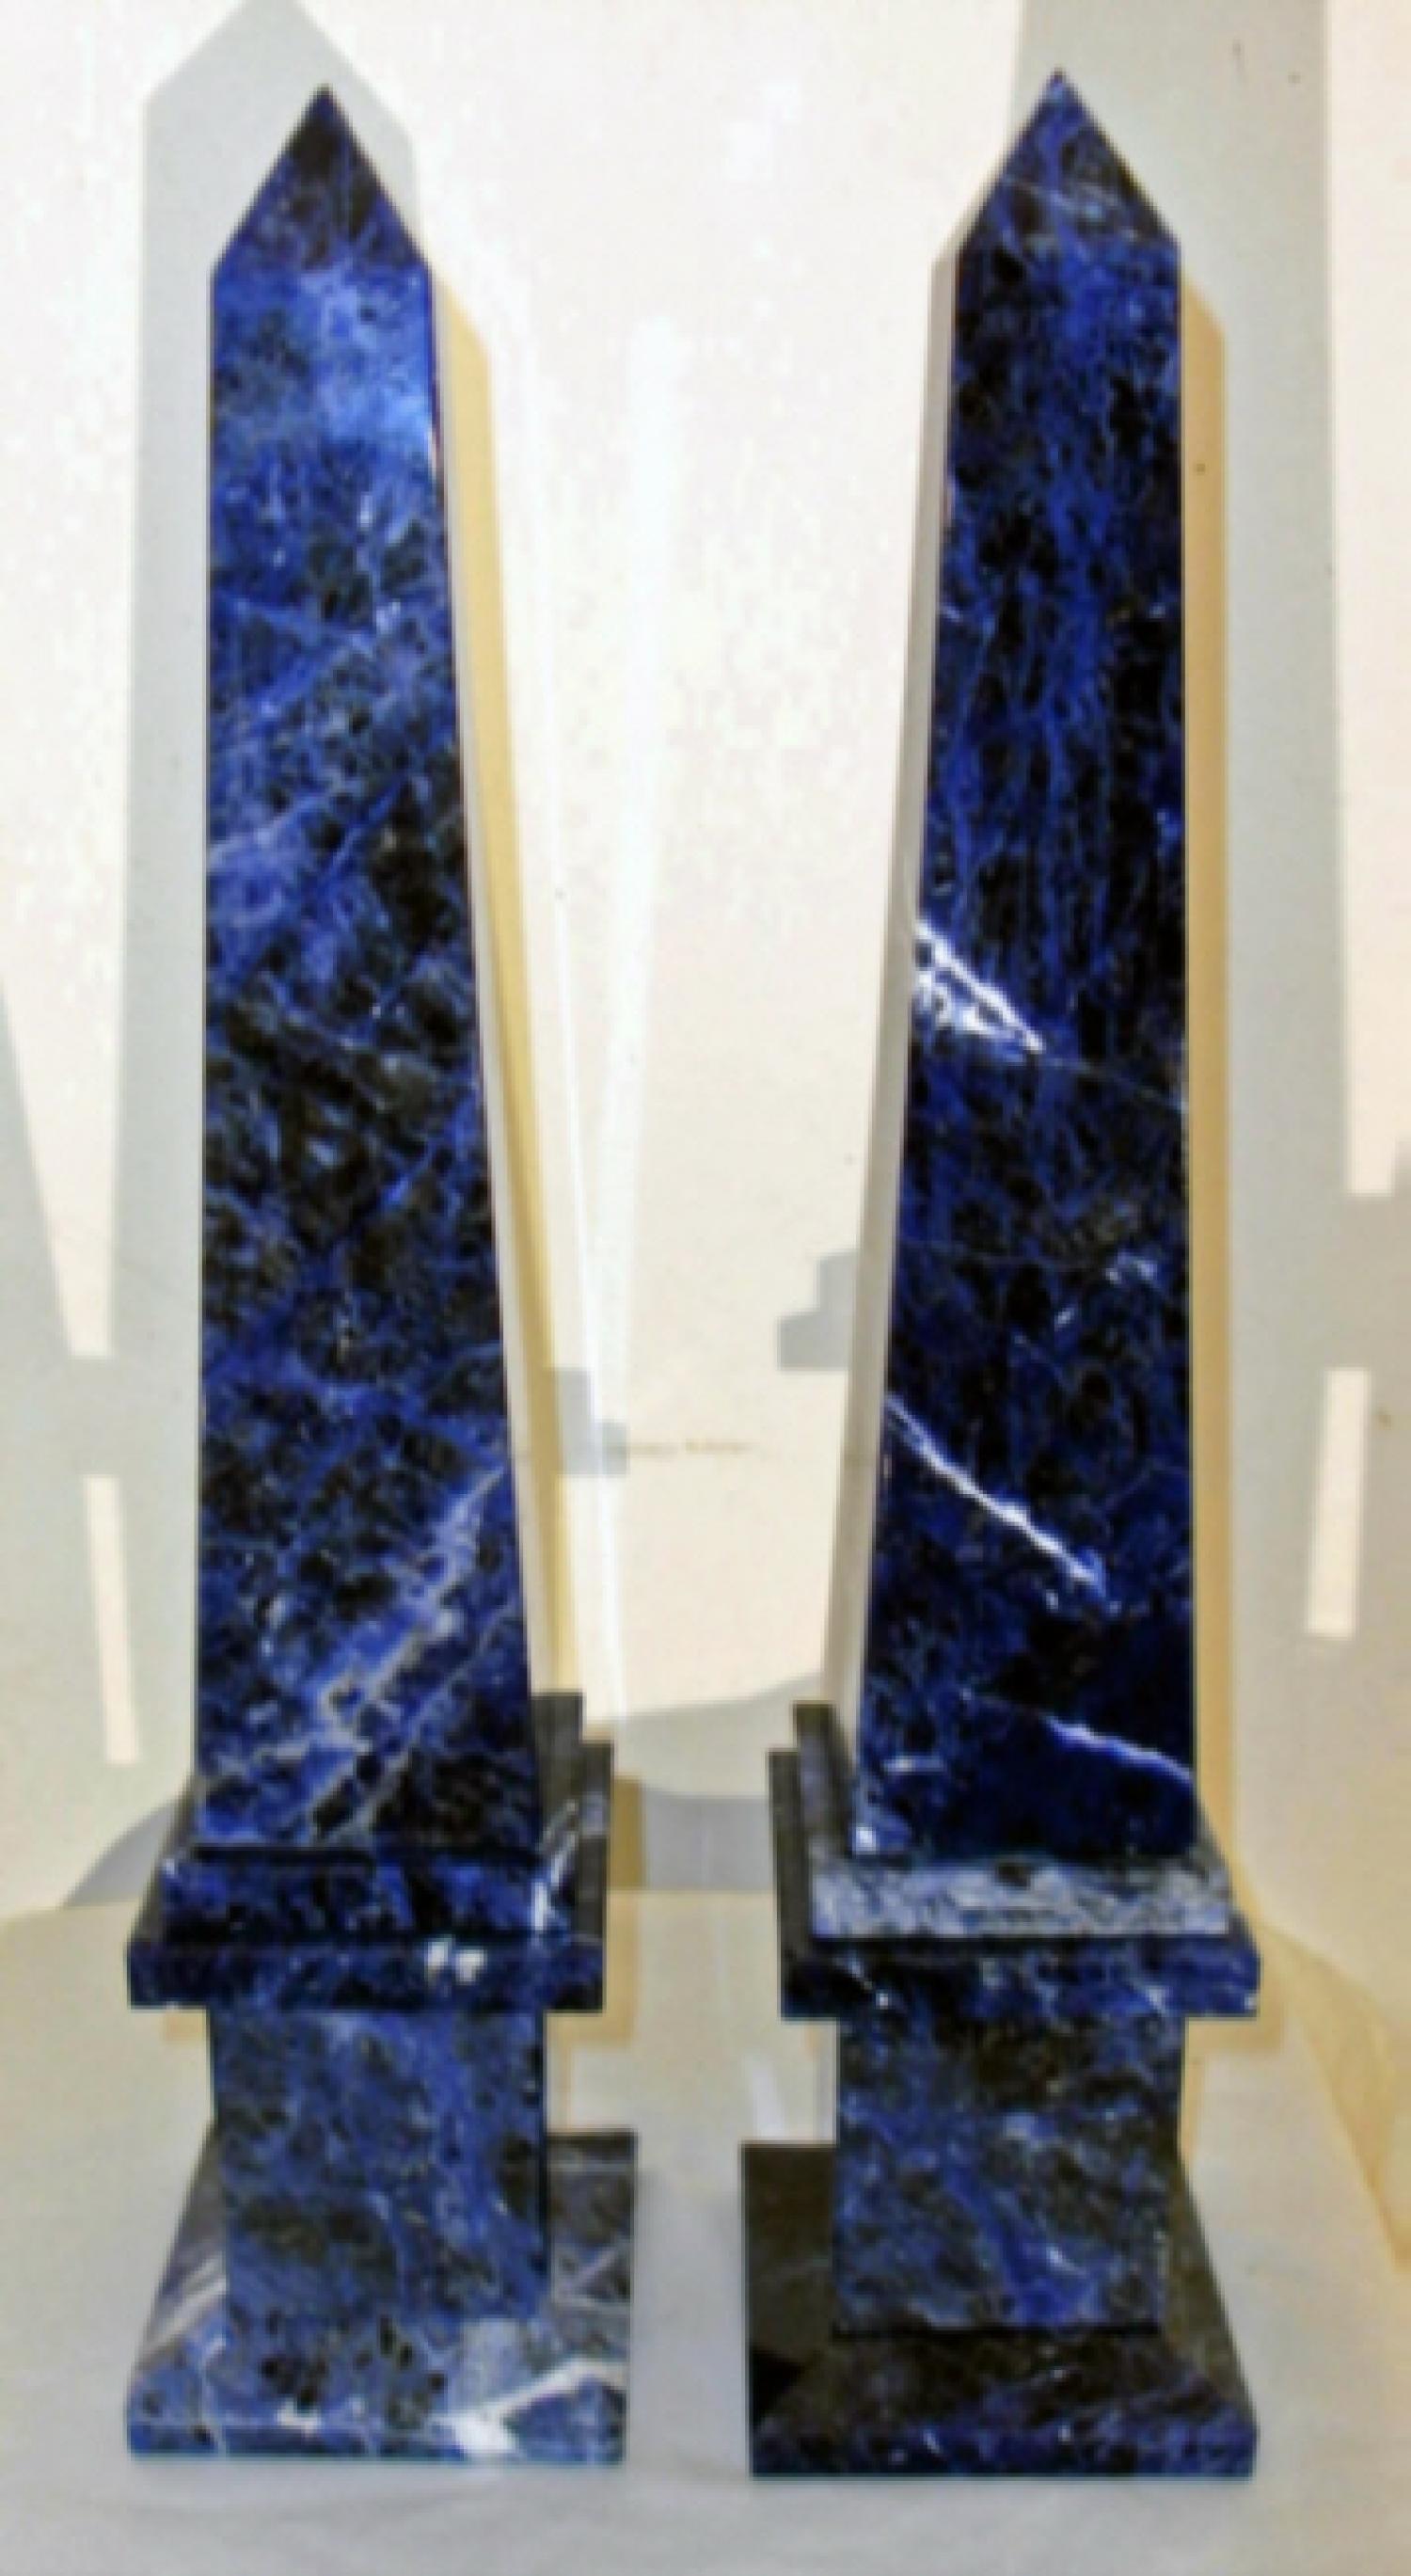 Antique blue lapis obelisks in the Grand Tour style